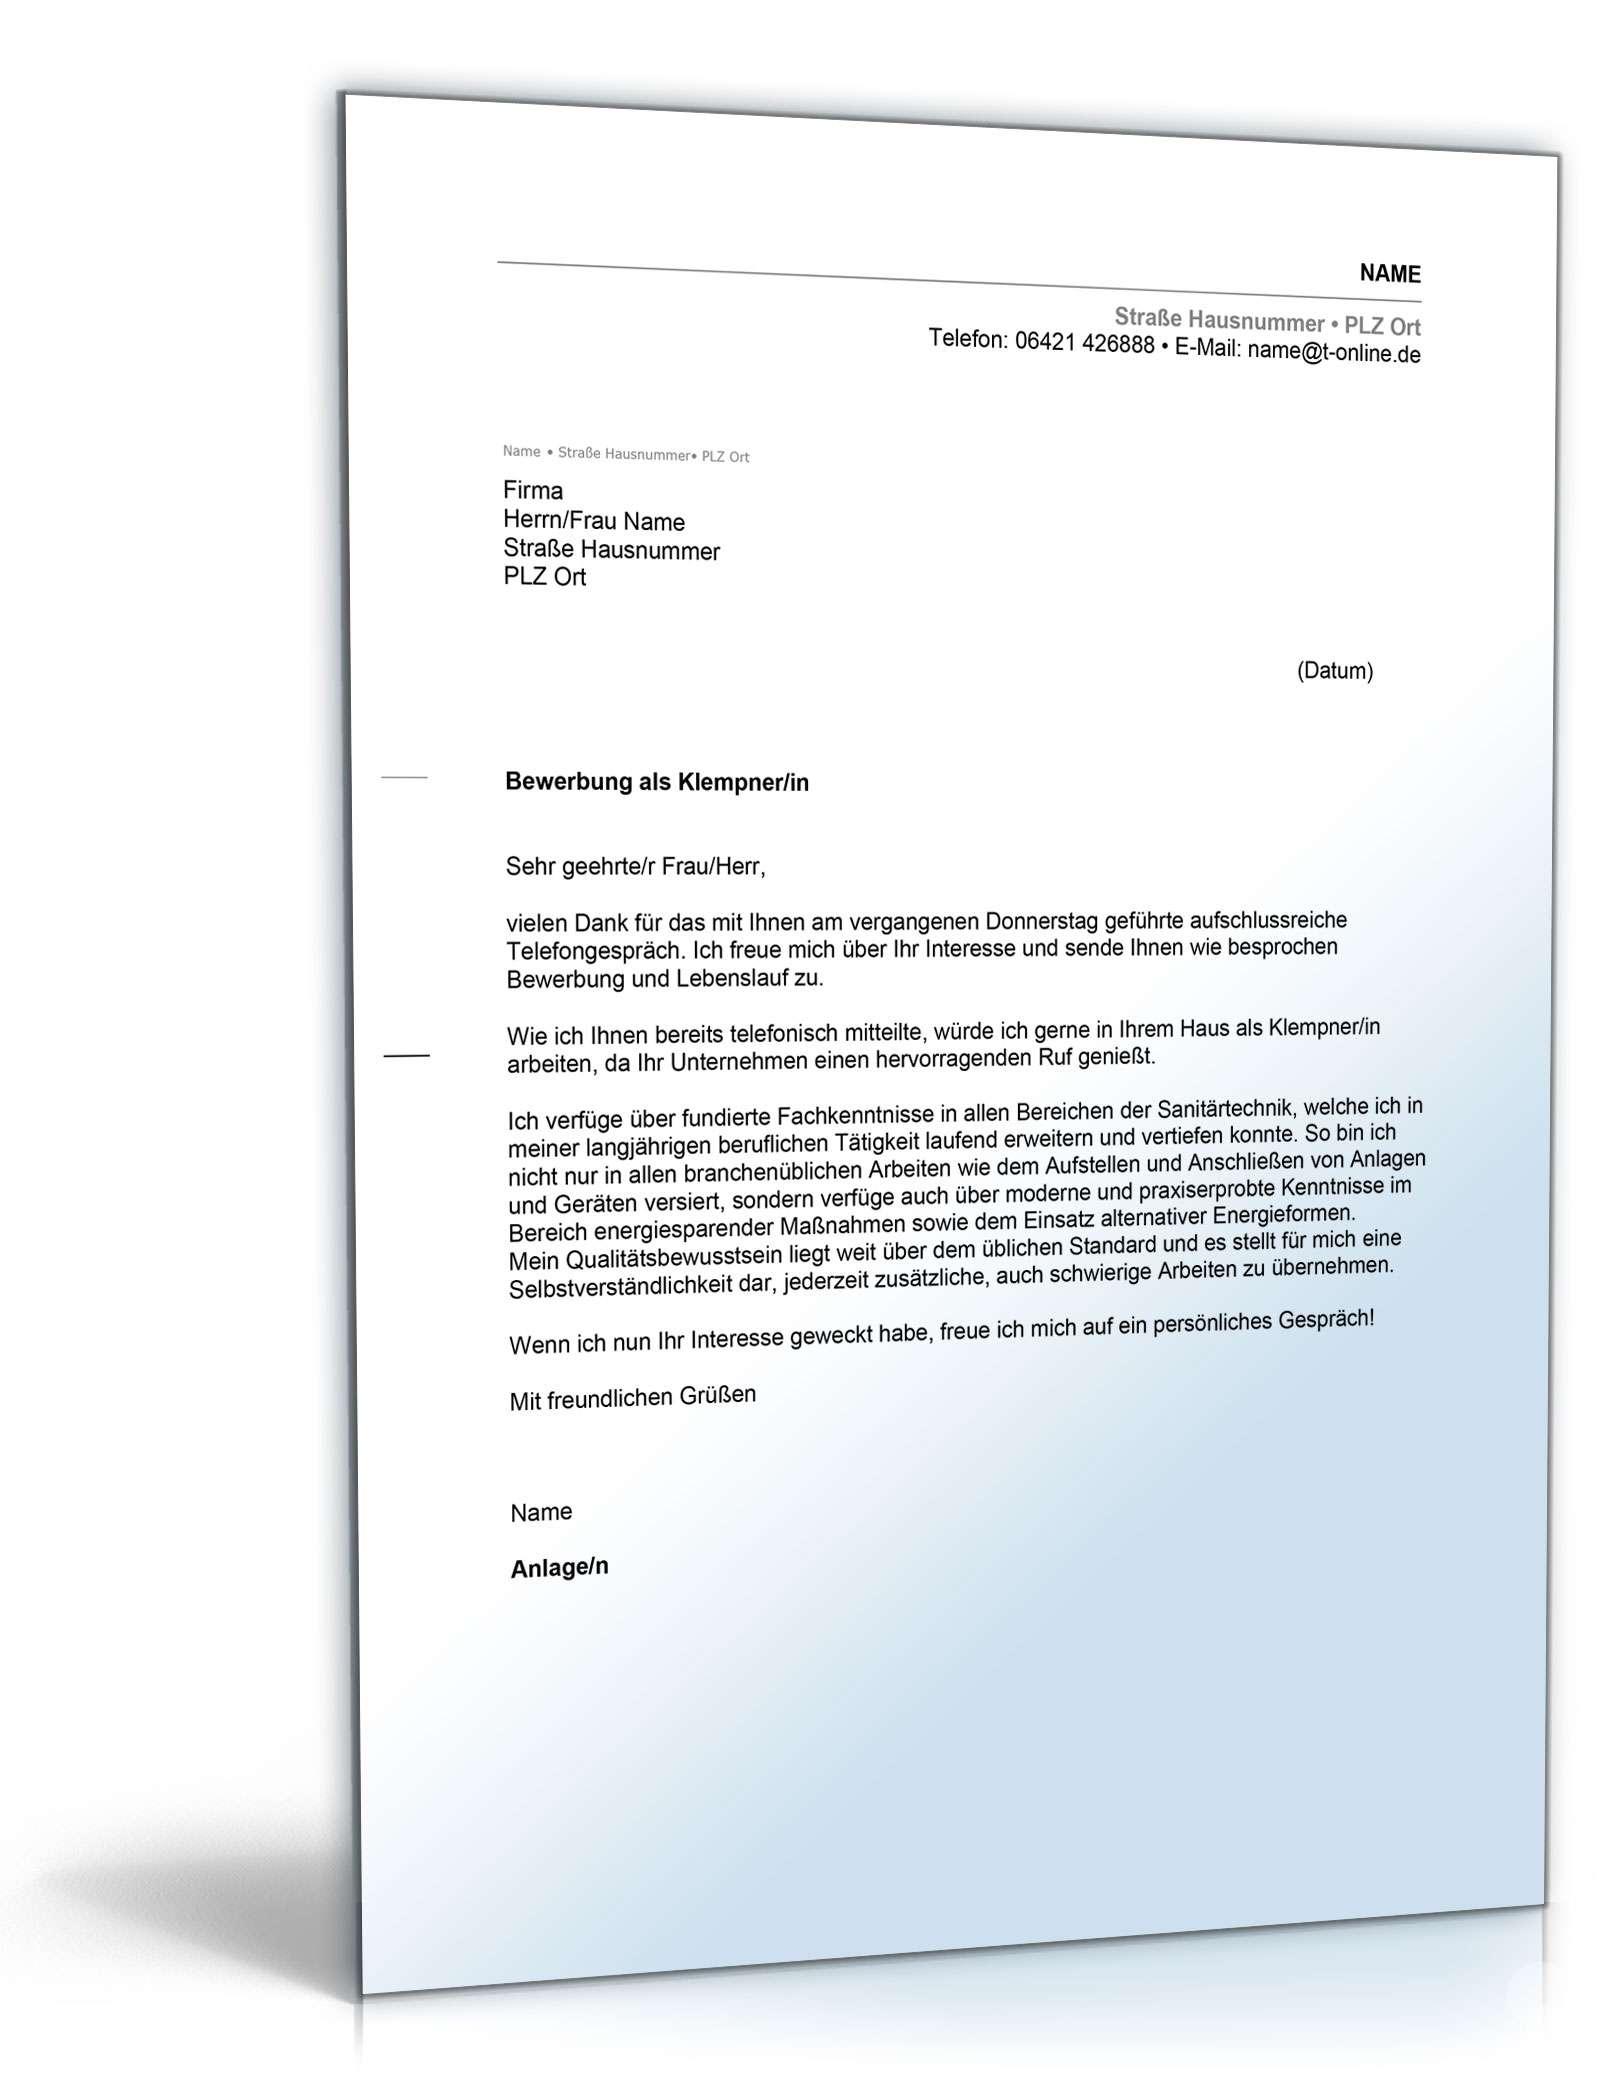 Anschreiben Bewerbung Klempner Muster Zum Download